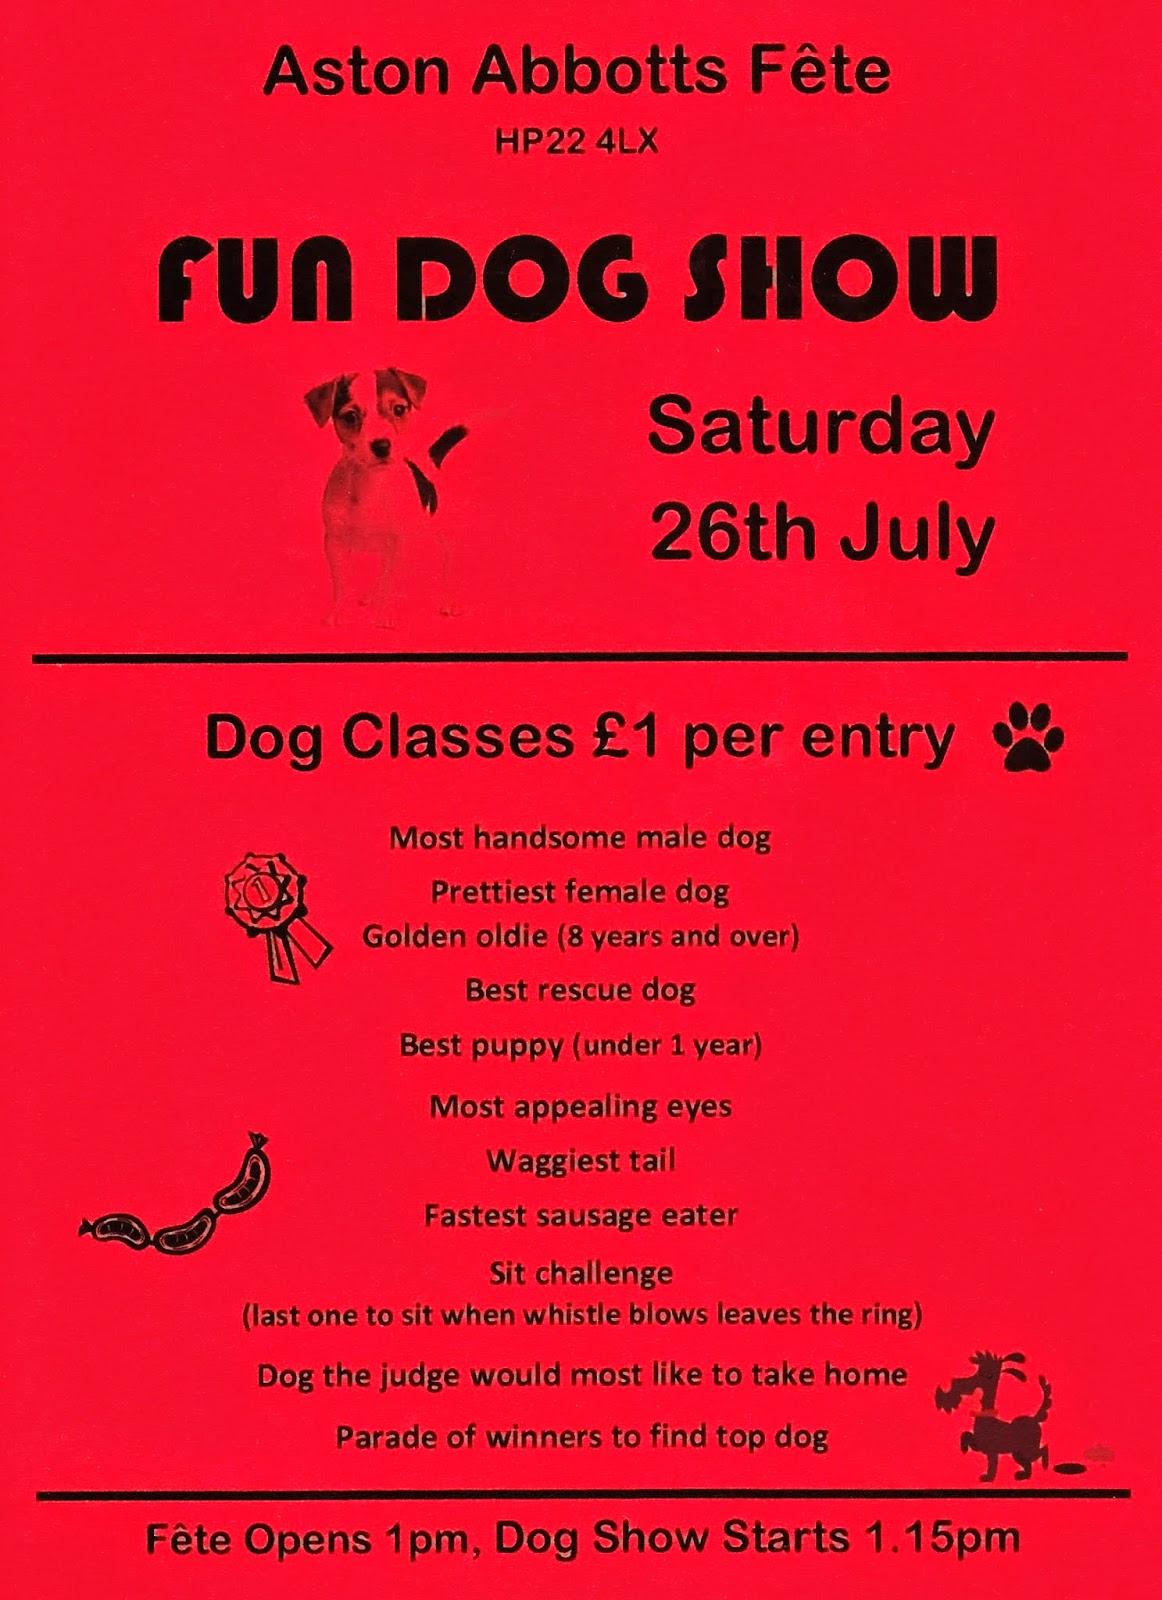 Aston Abbotts Dog Show poster